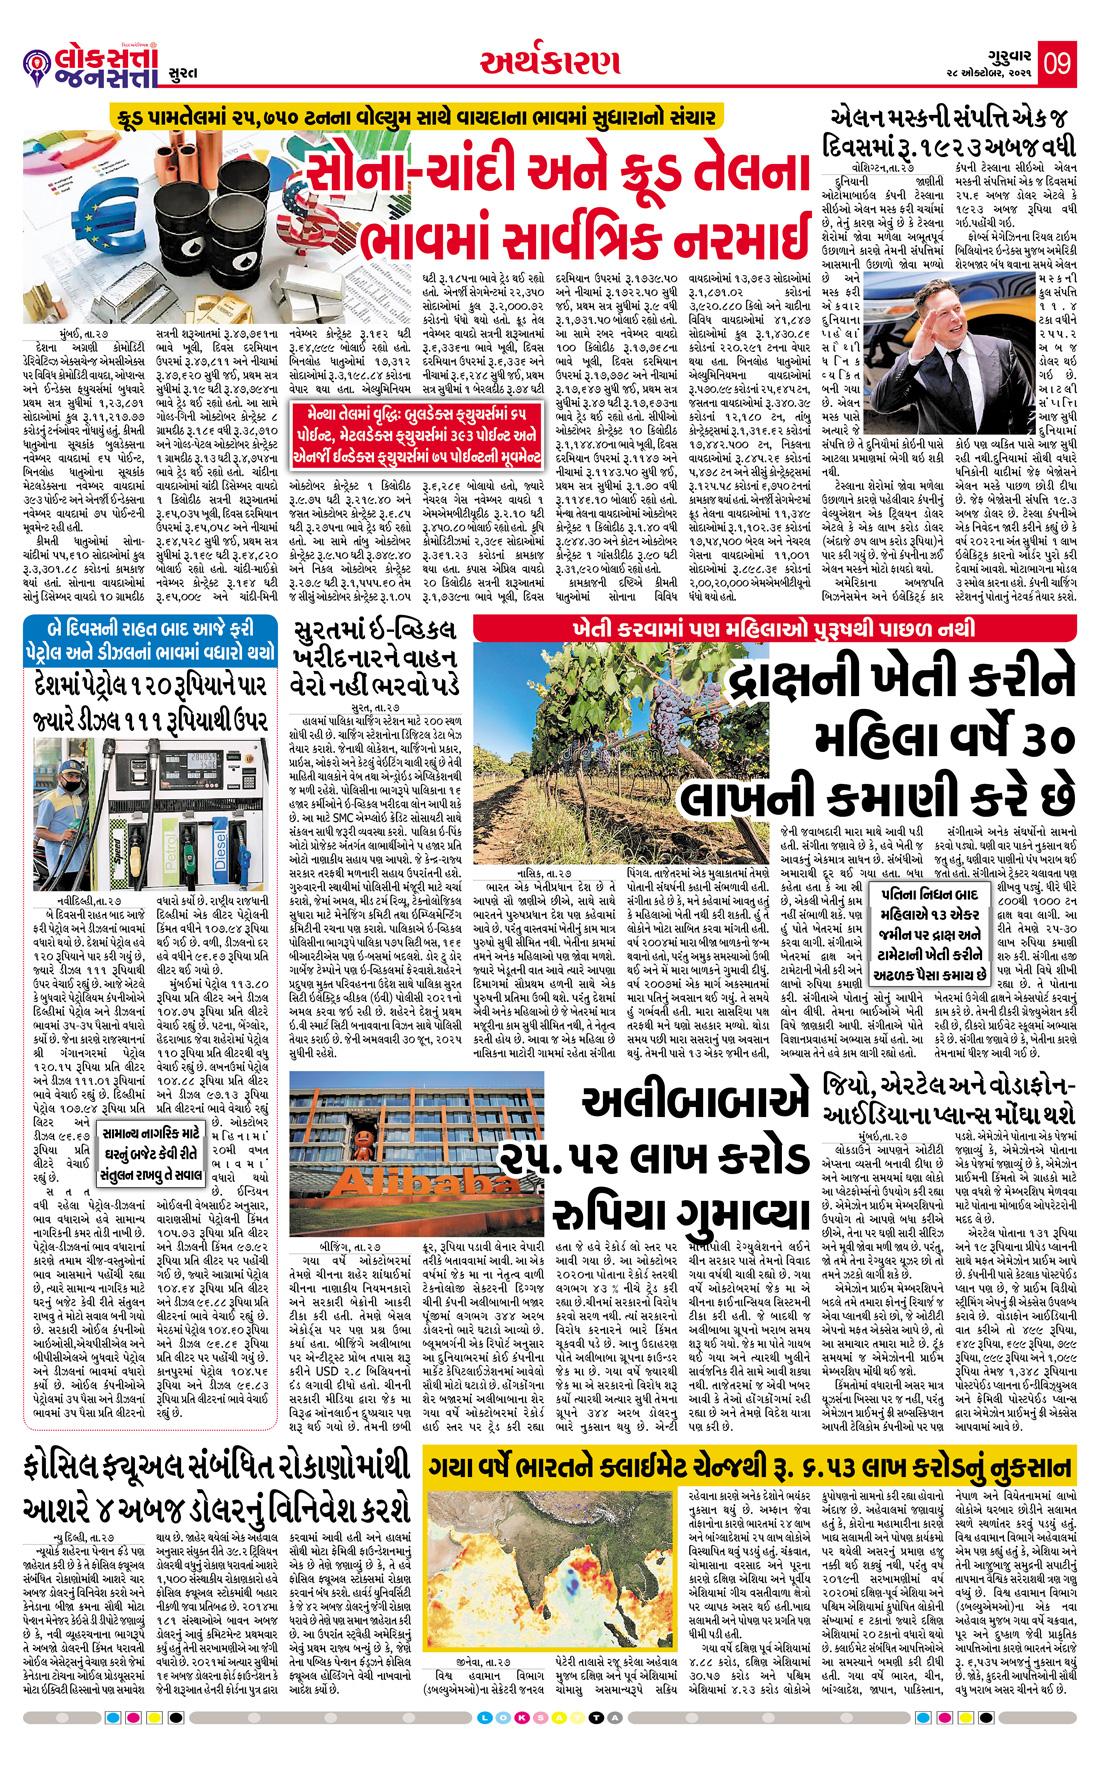 Loksatta Jansatta News Papaer E-paper dated 2021-10-28   Page 9